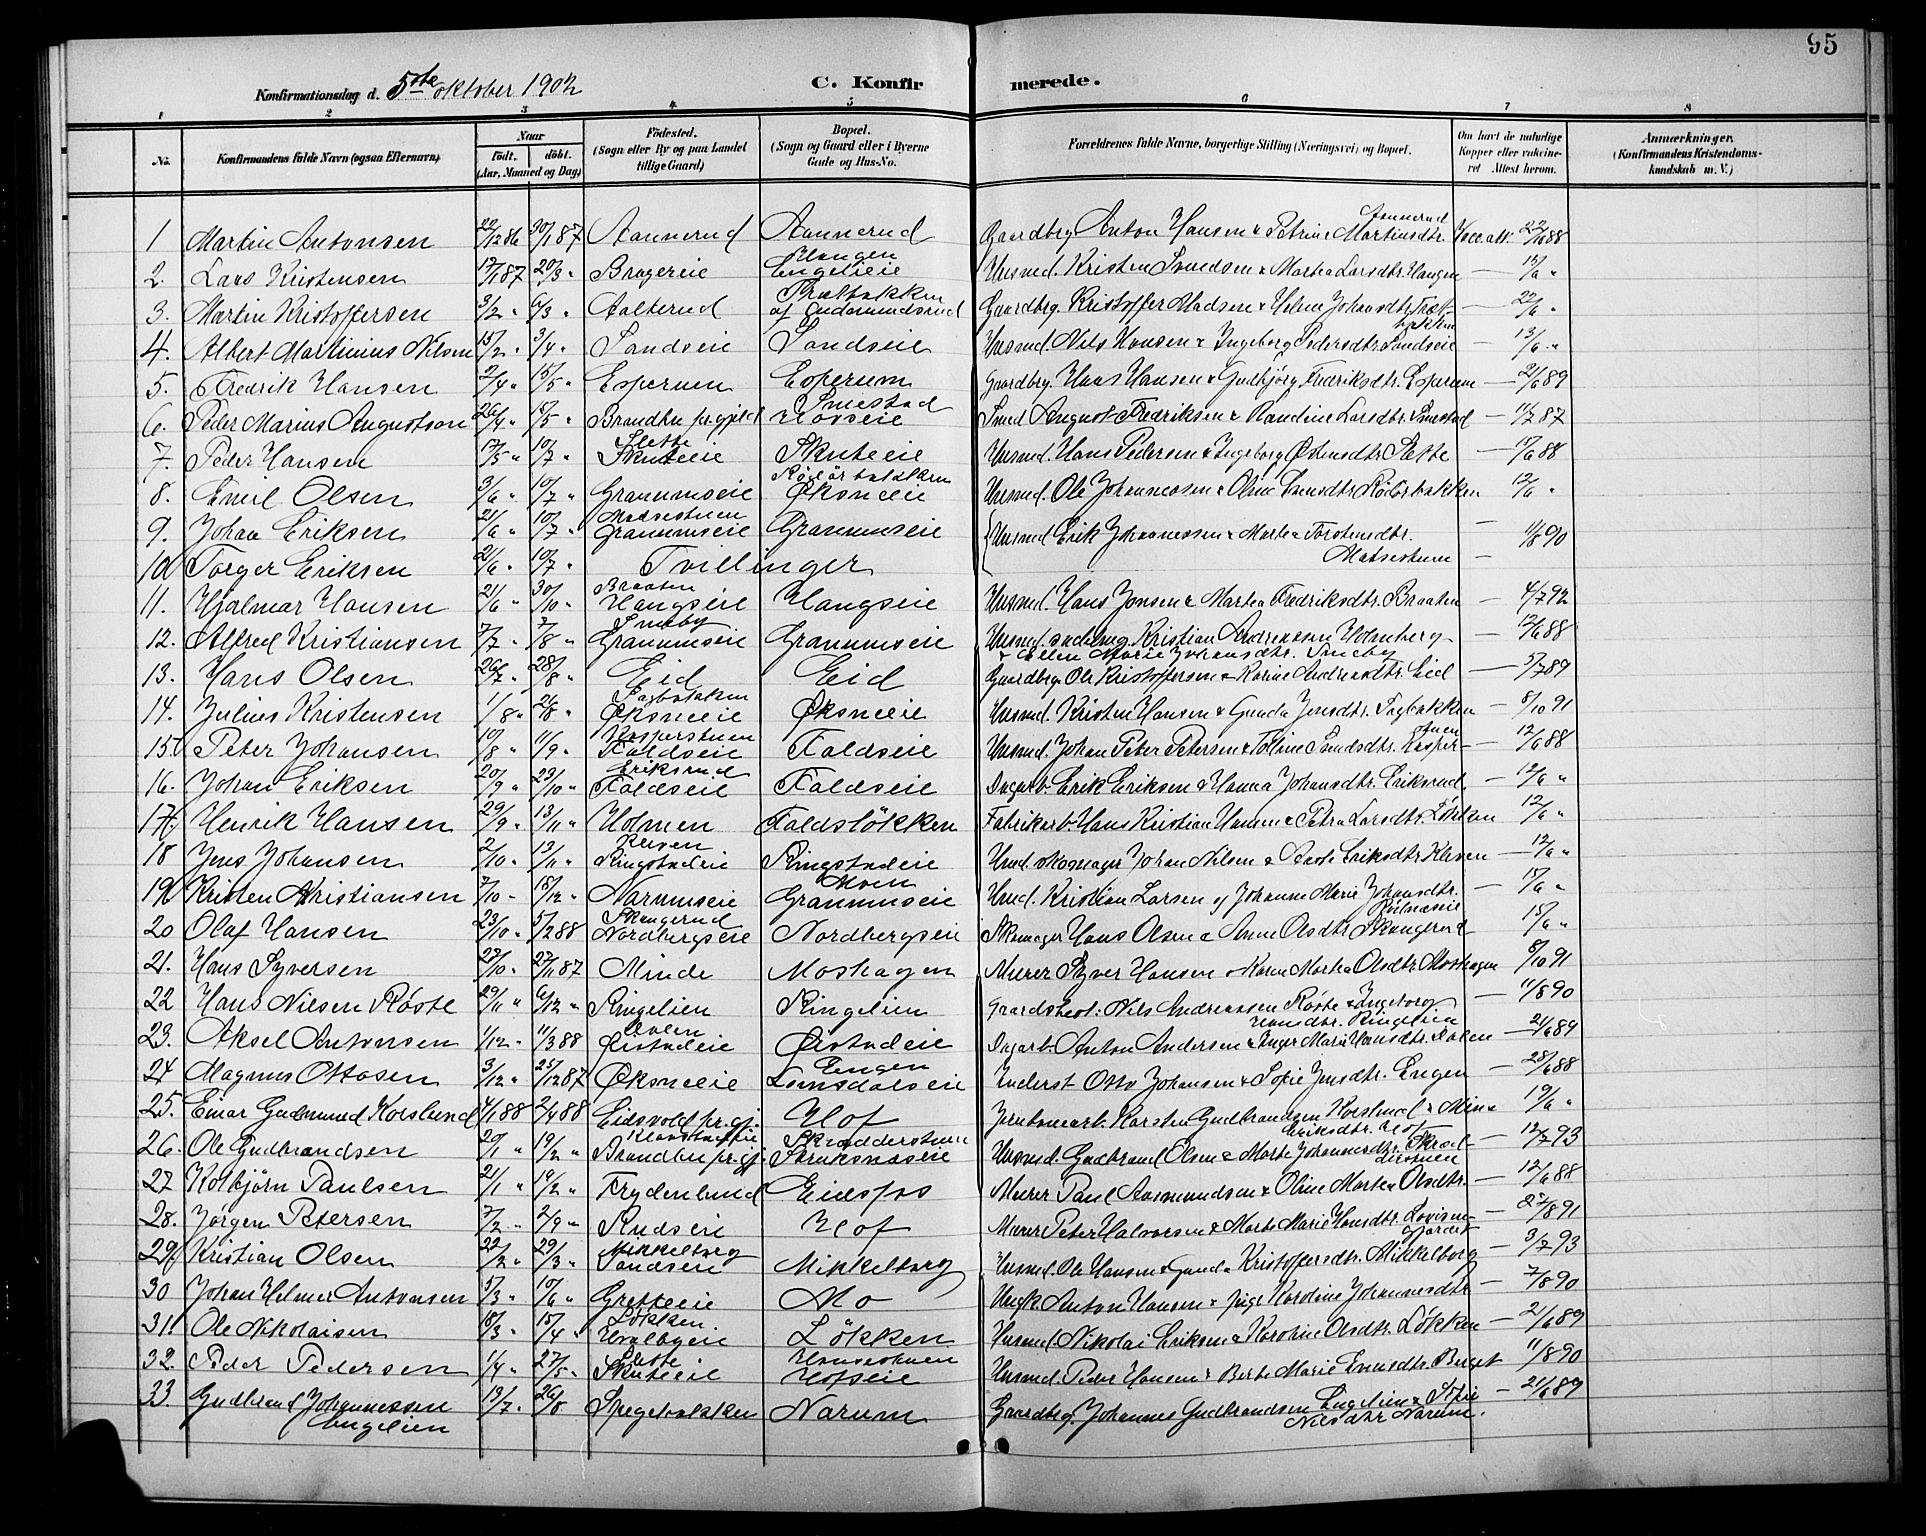 SAH, Søndre Land prestekontor, L/L0004: Klokkerbok nr. 4, 1901-1915, s. 95